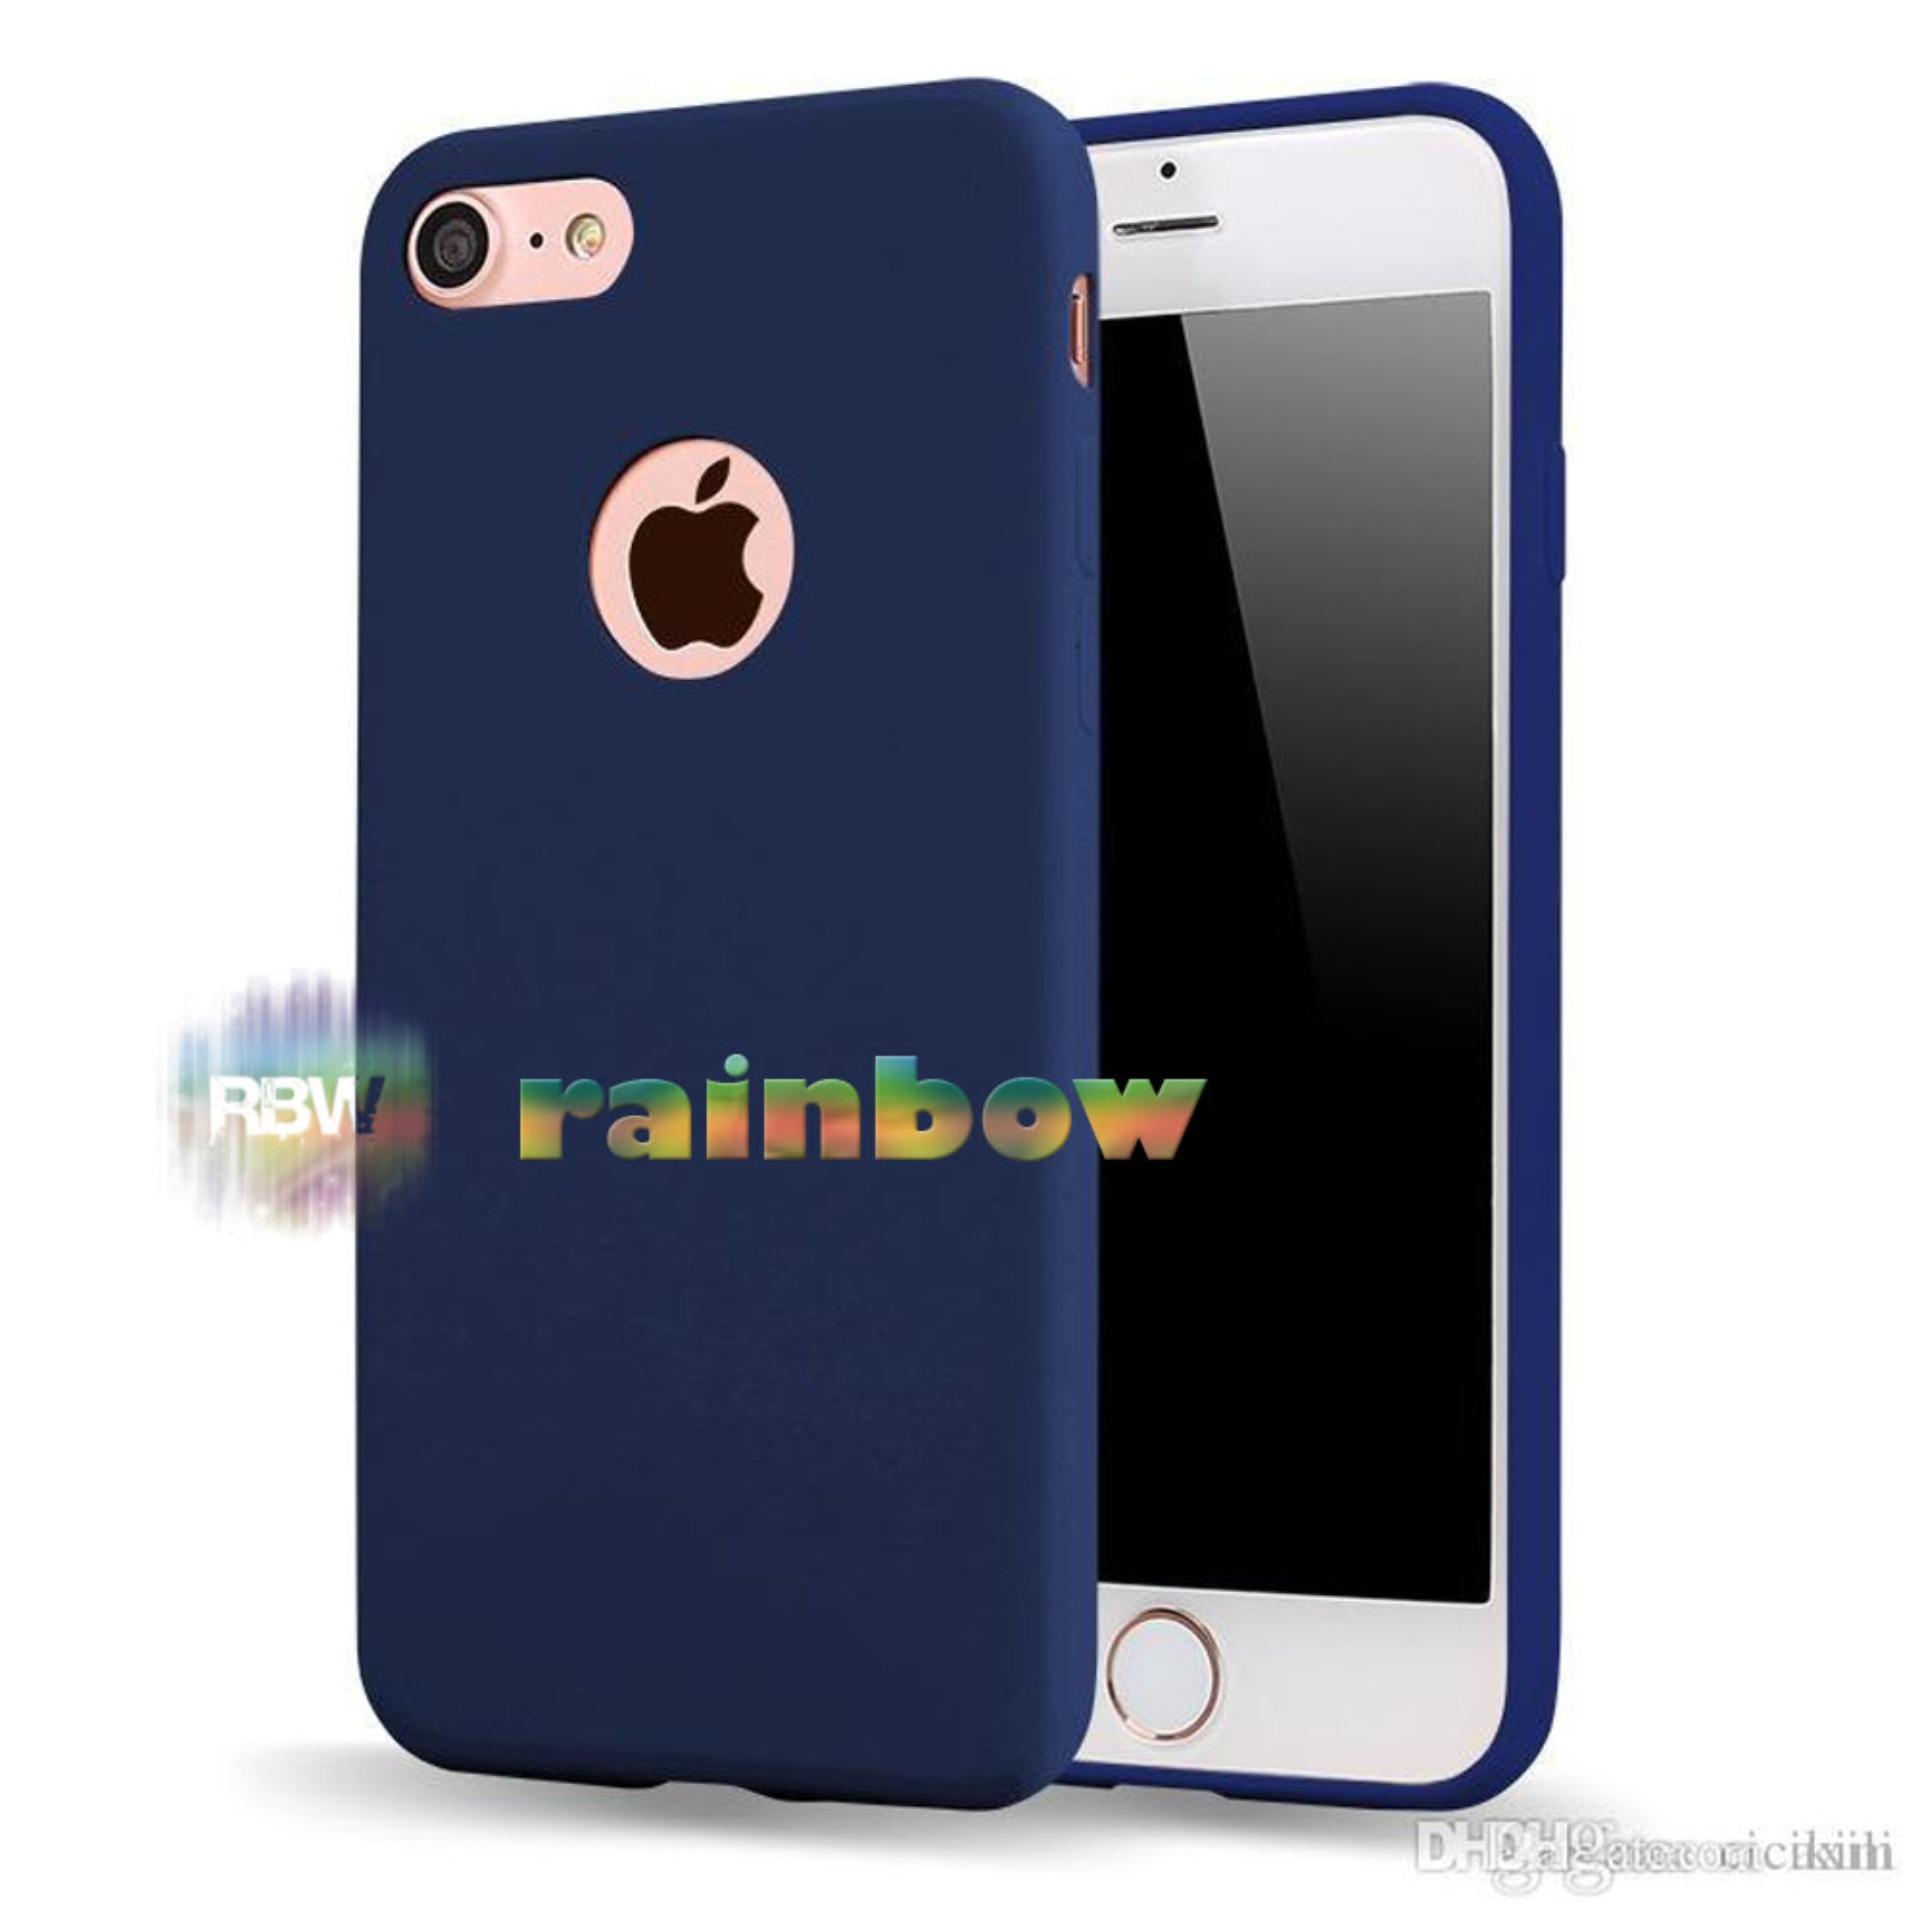 Lize Apple Iphone5 / Iphone 5 / Iphone 5G / Iphone 5S Ori / Softshell / Jelly Case / Soft Case / Soft Back Case / Silicone / Silicon / Silikon / Case Iphone / Case HP / Casing Handphone Iphone 5 - Biru Tua